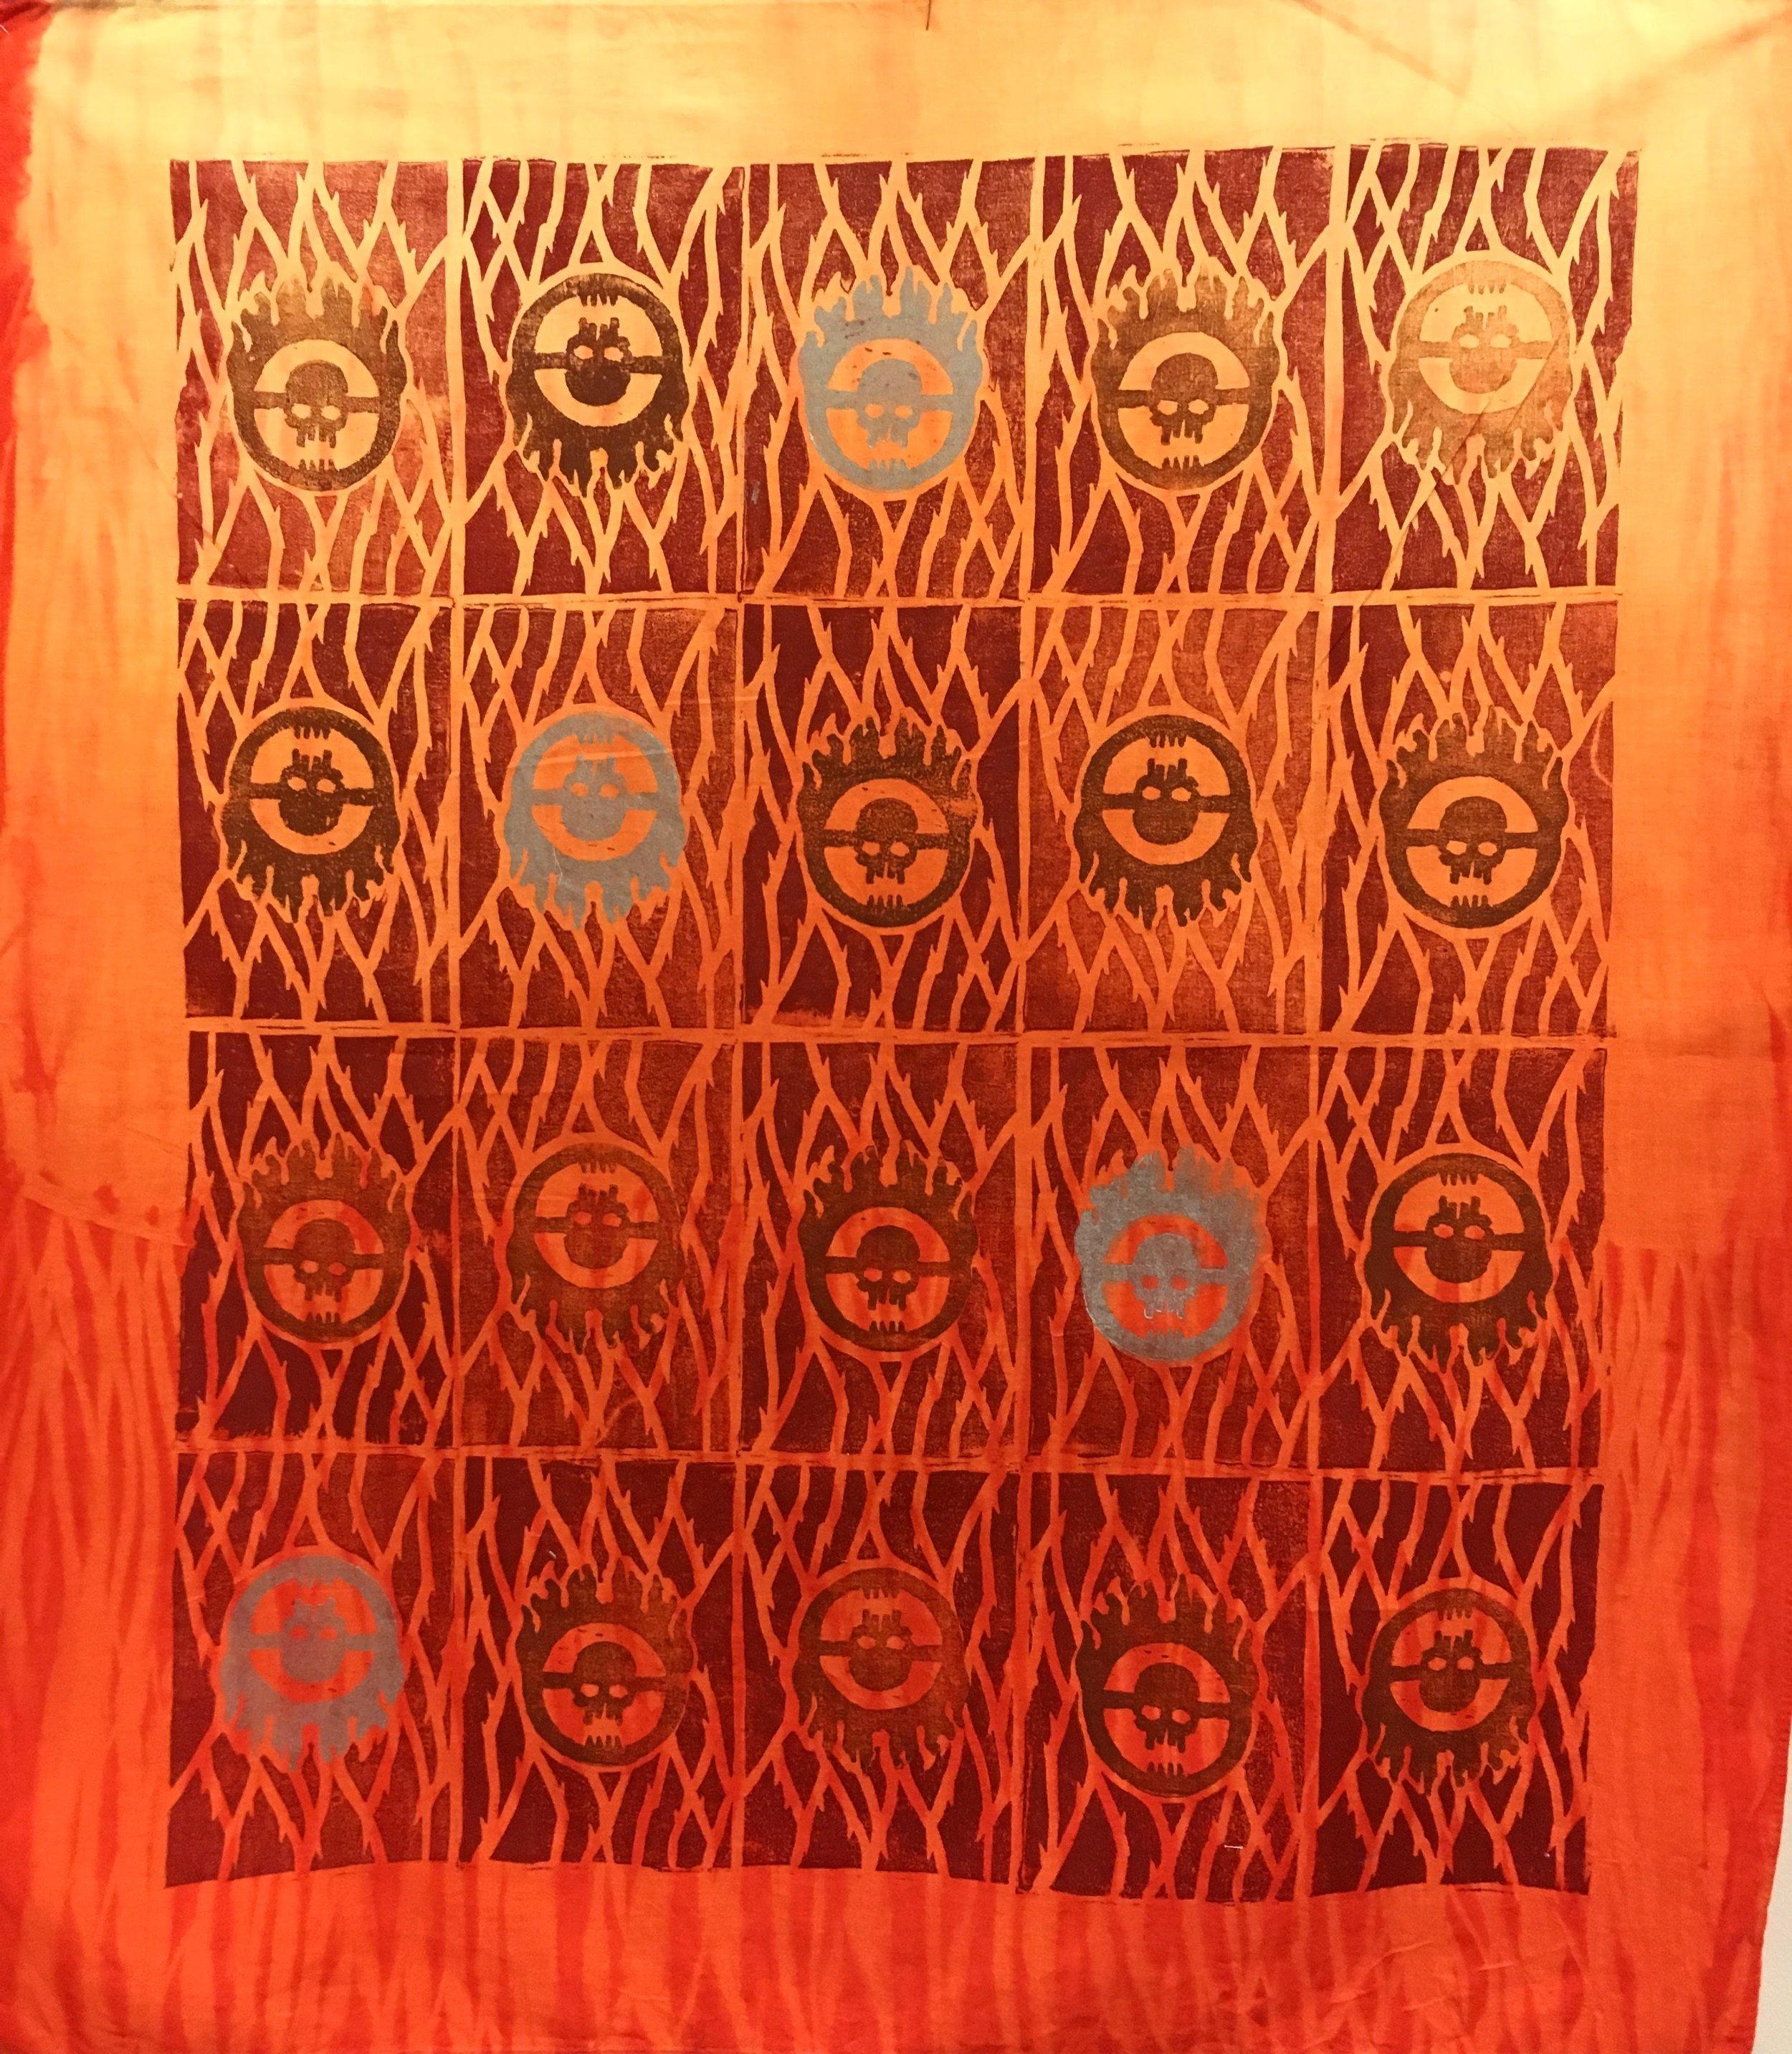 Dyer/Painter  Block Printing, Shibori, & Ombre  Designer - Tessa Barlotta